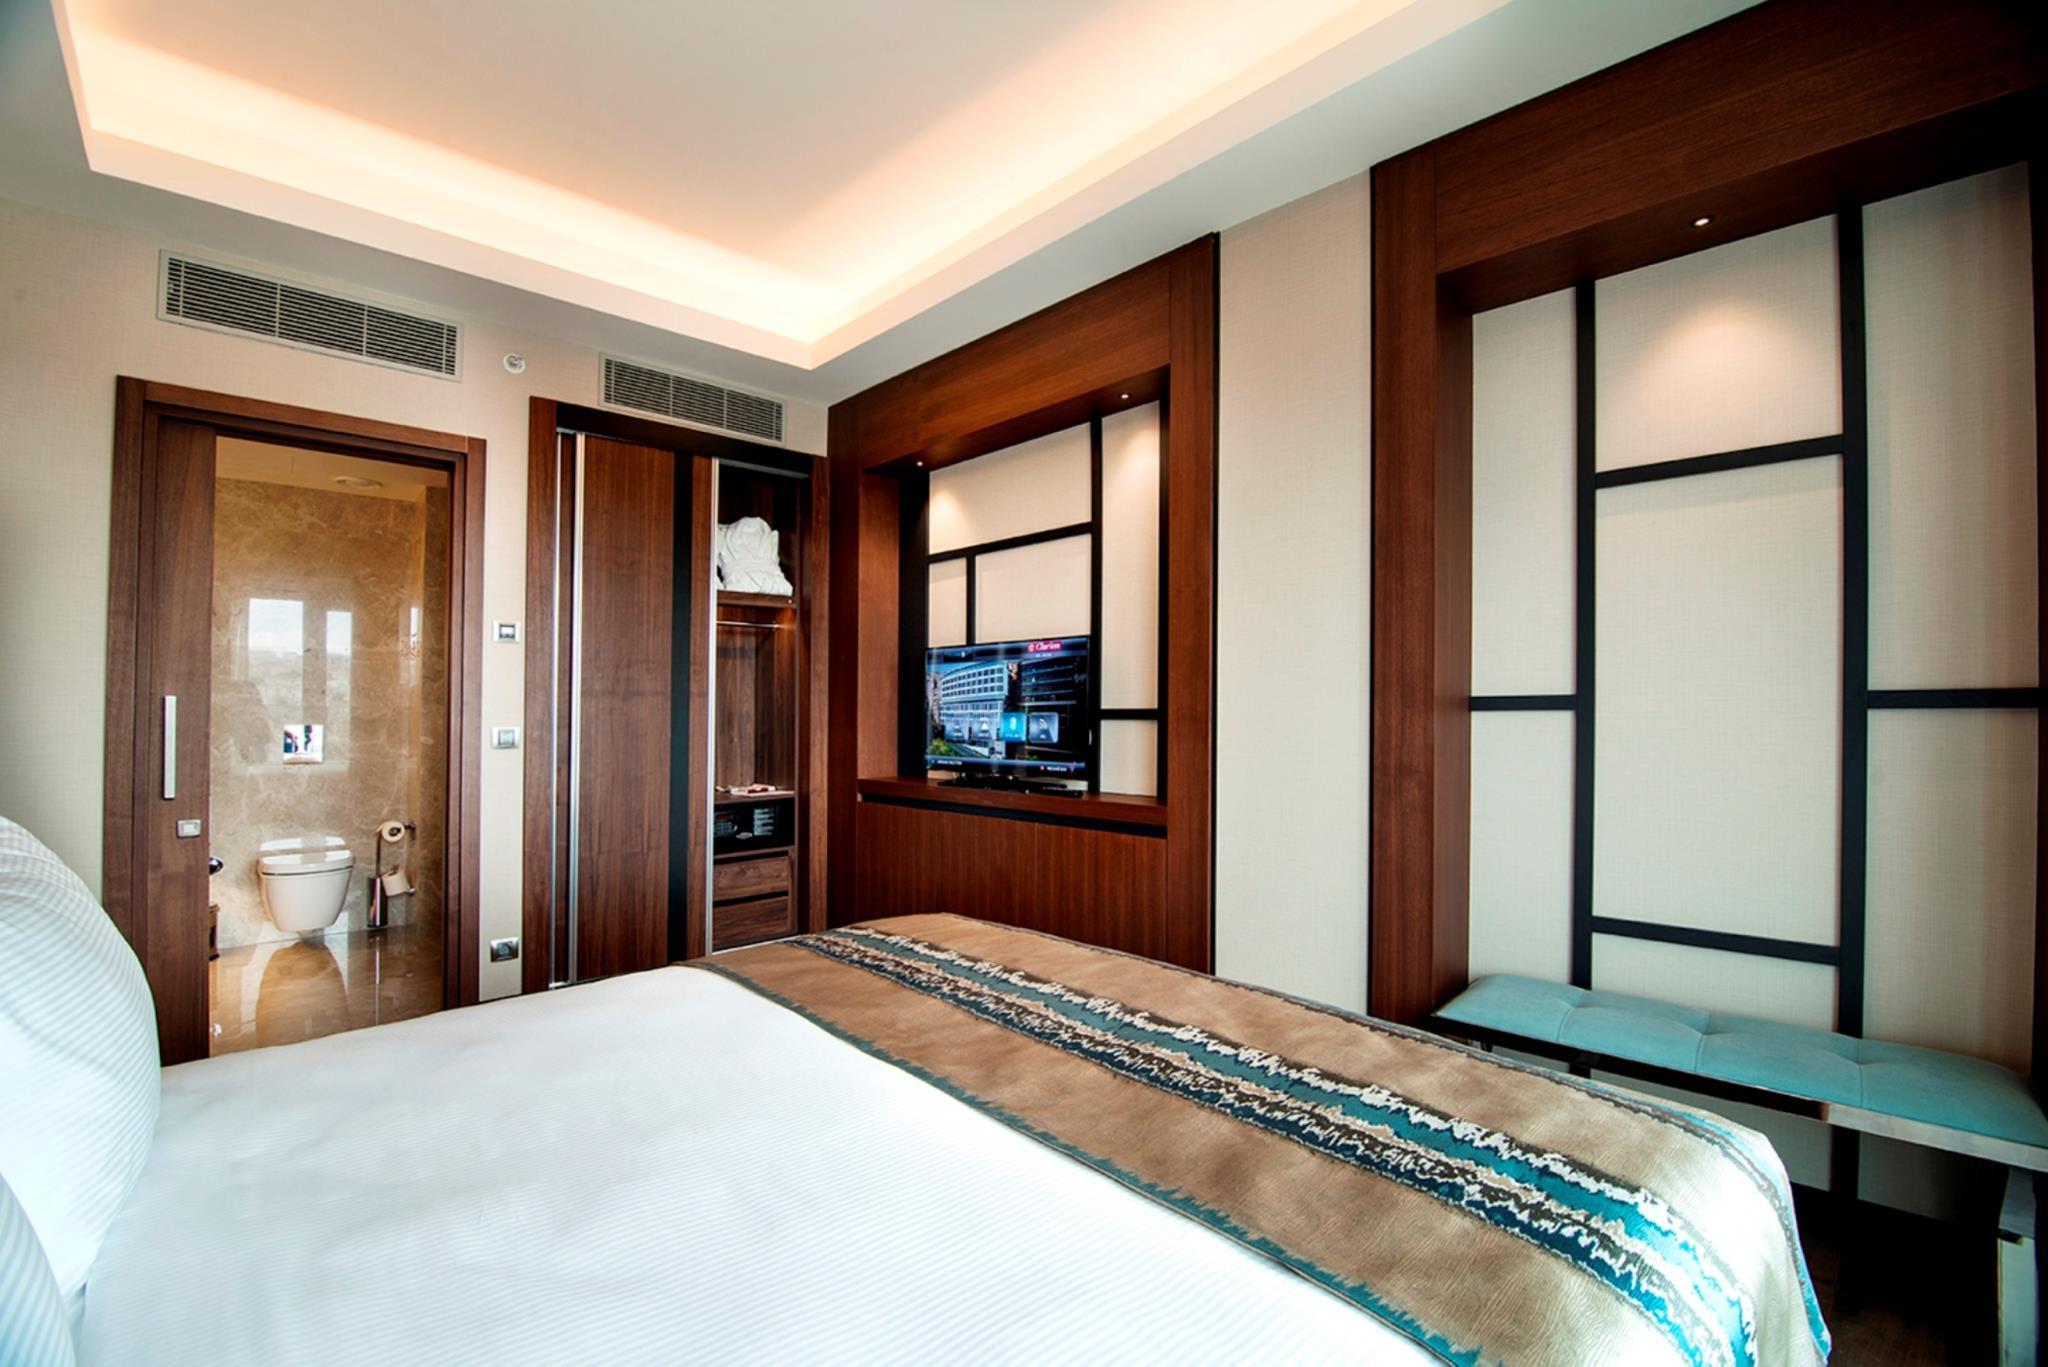 هتل کلاریون گولدن هورن استانبول